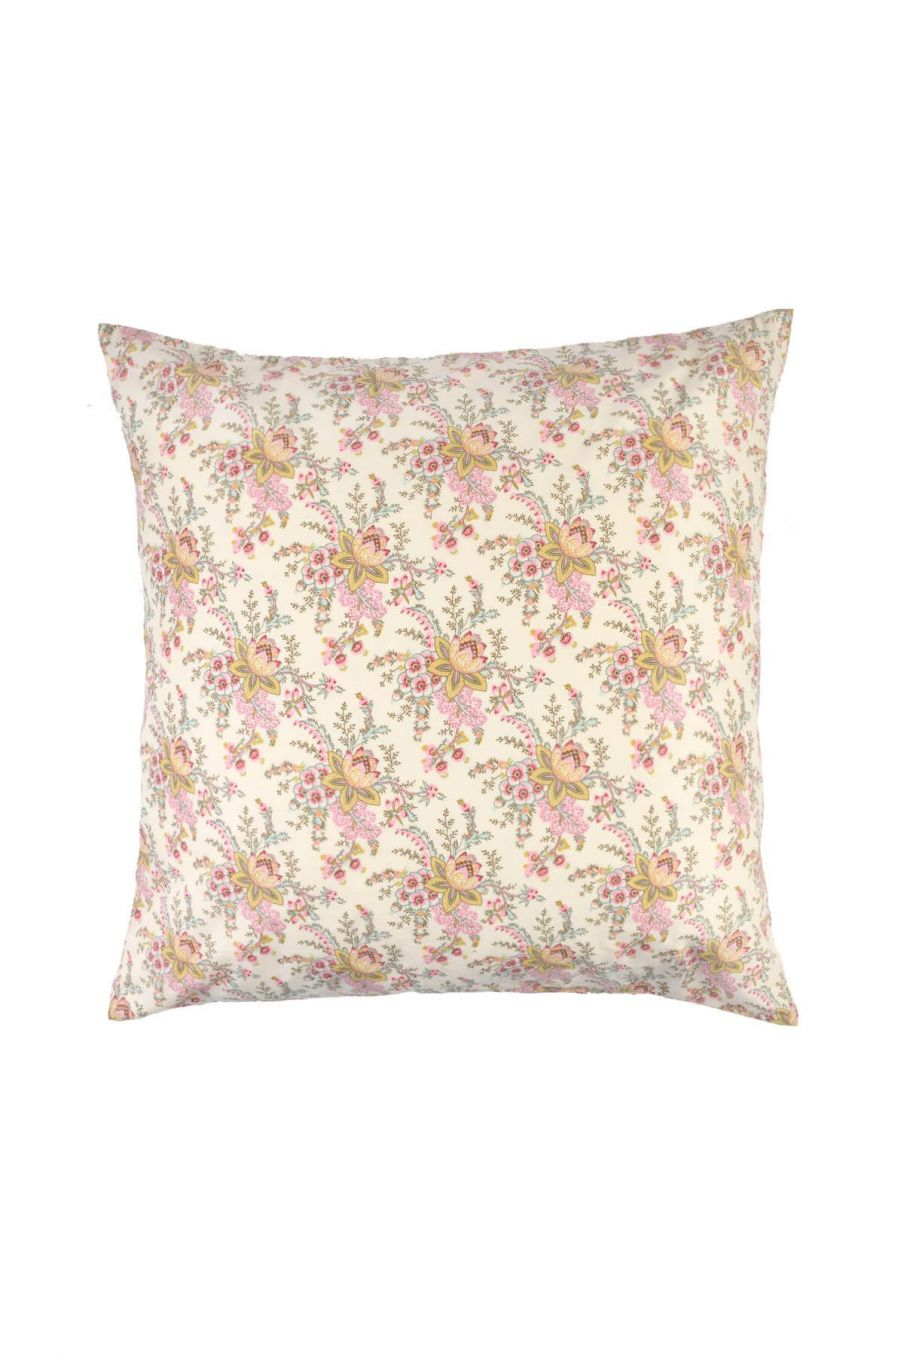 taie d'oreiller maison valerie cream french flowers - louise misha